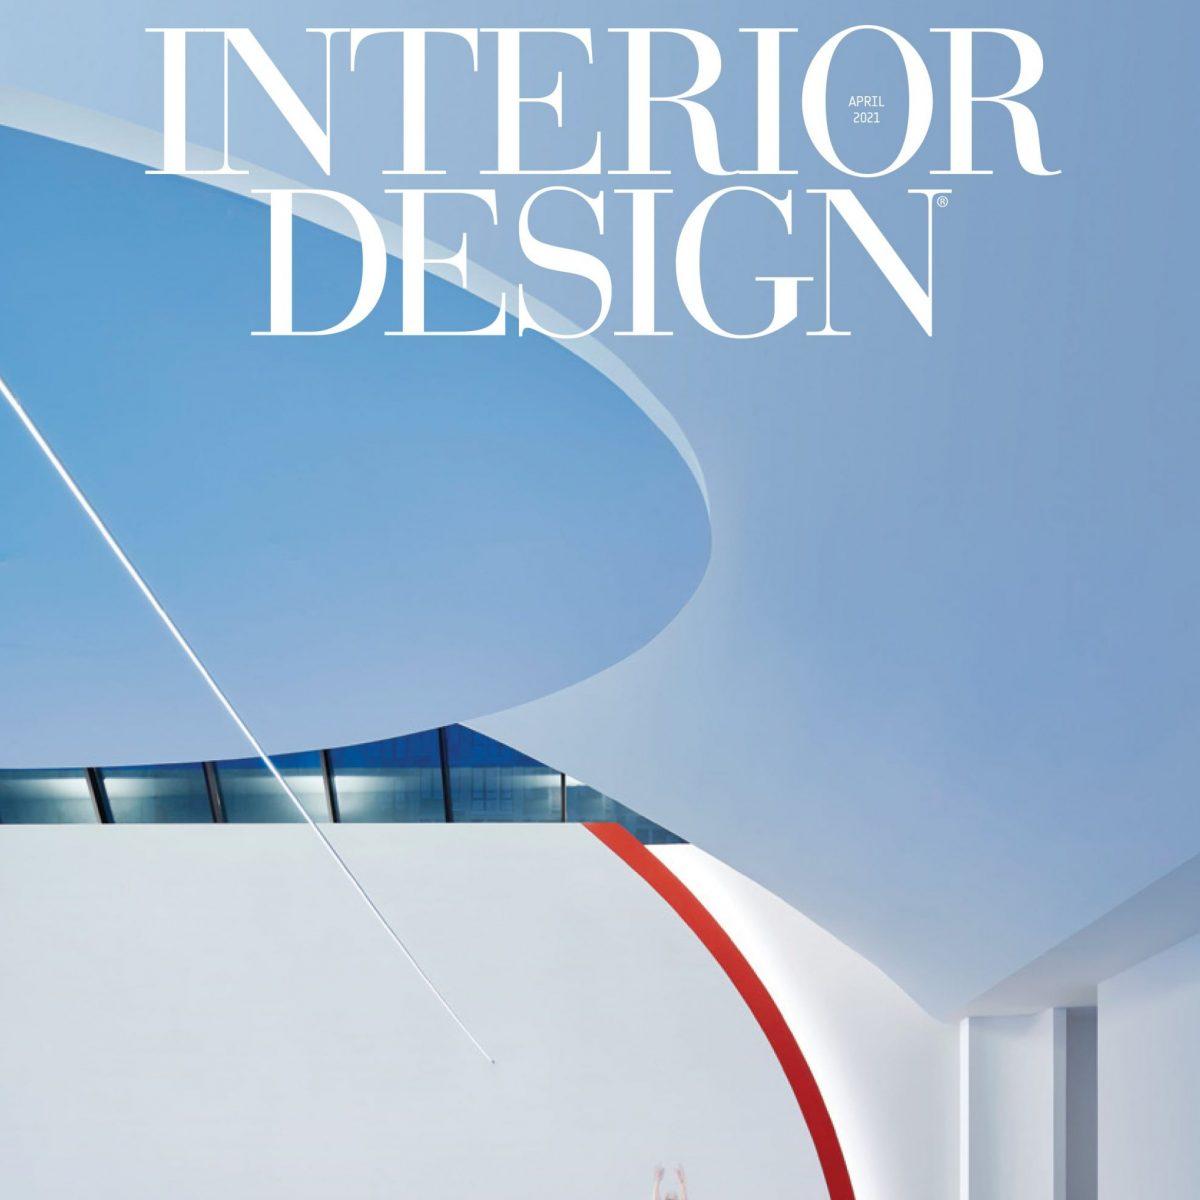 Časopis Interior Design a editorial kanceláře Fortuna Entertainment Group